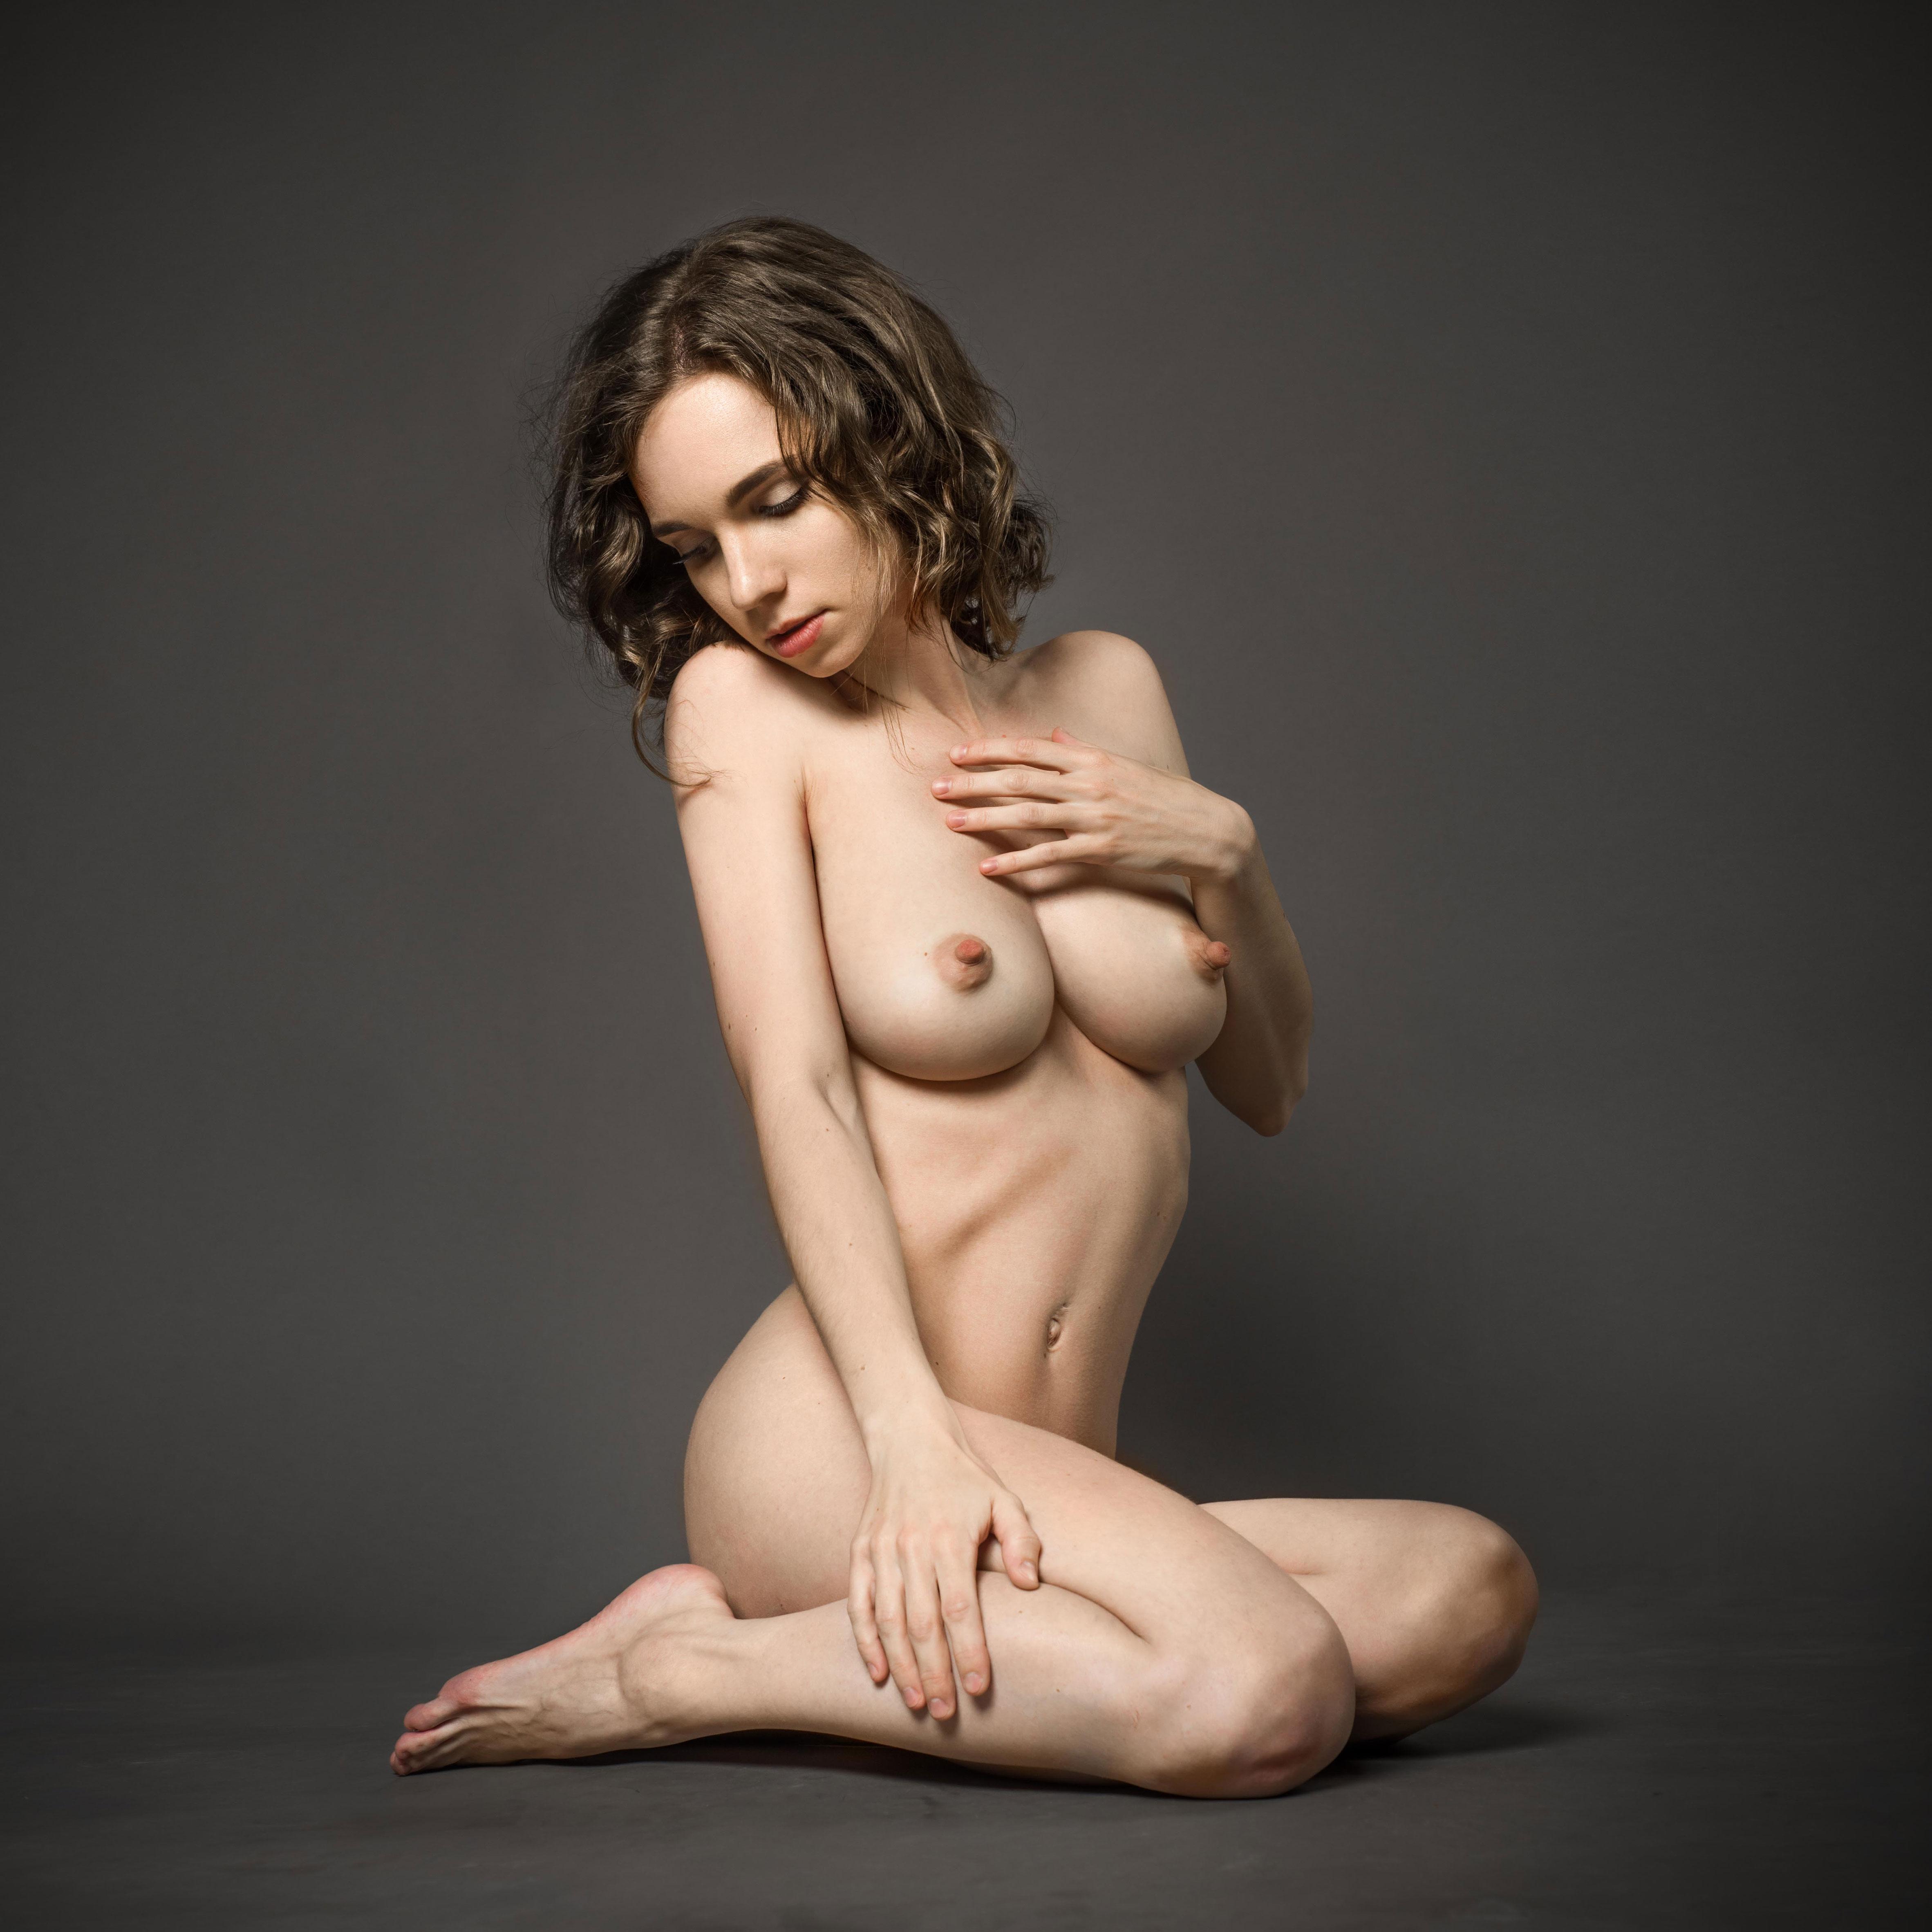 Голая Анна Меньшикова / Anna Menshikova nude by Anton Smolsky